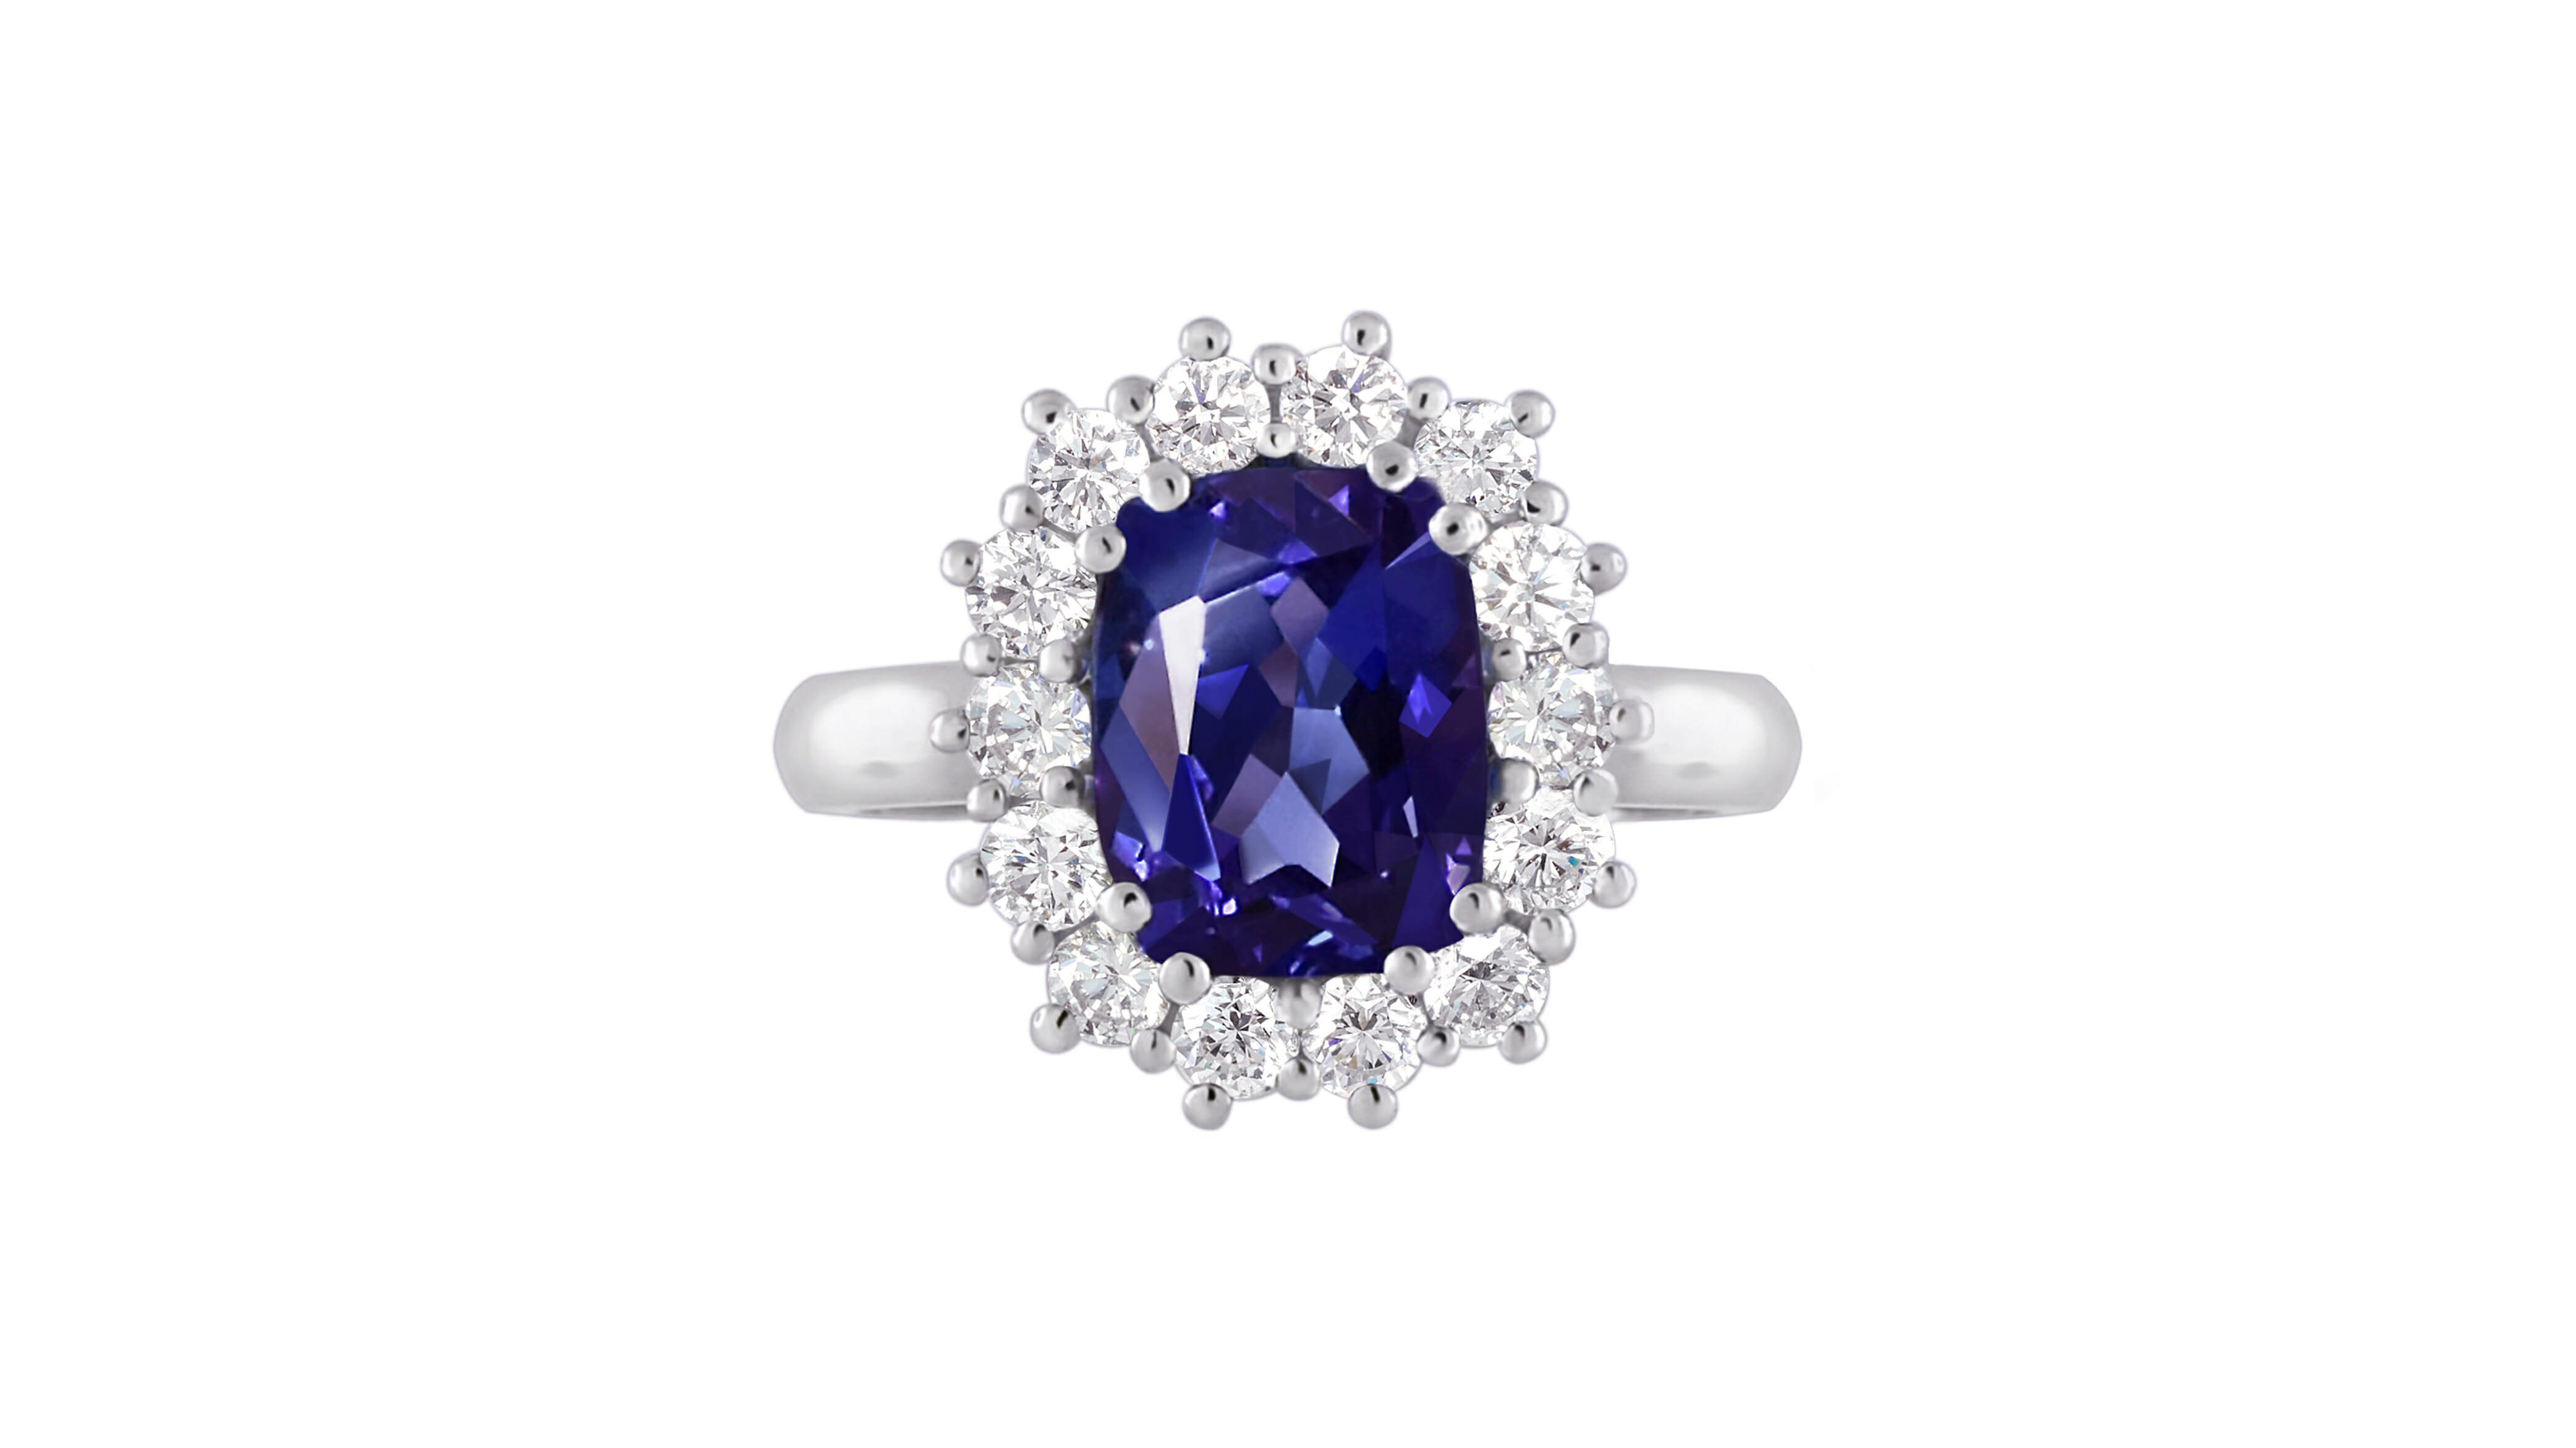 Rare african tanzanite and diamond ring| Vivid violet blue cushion tanzanite and diamond ring set in 18 carat white gold